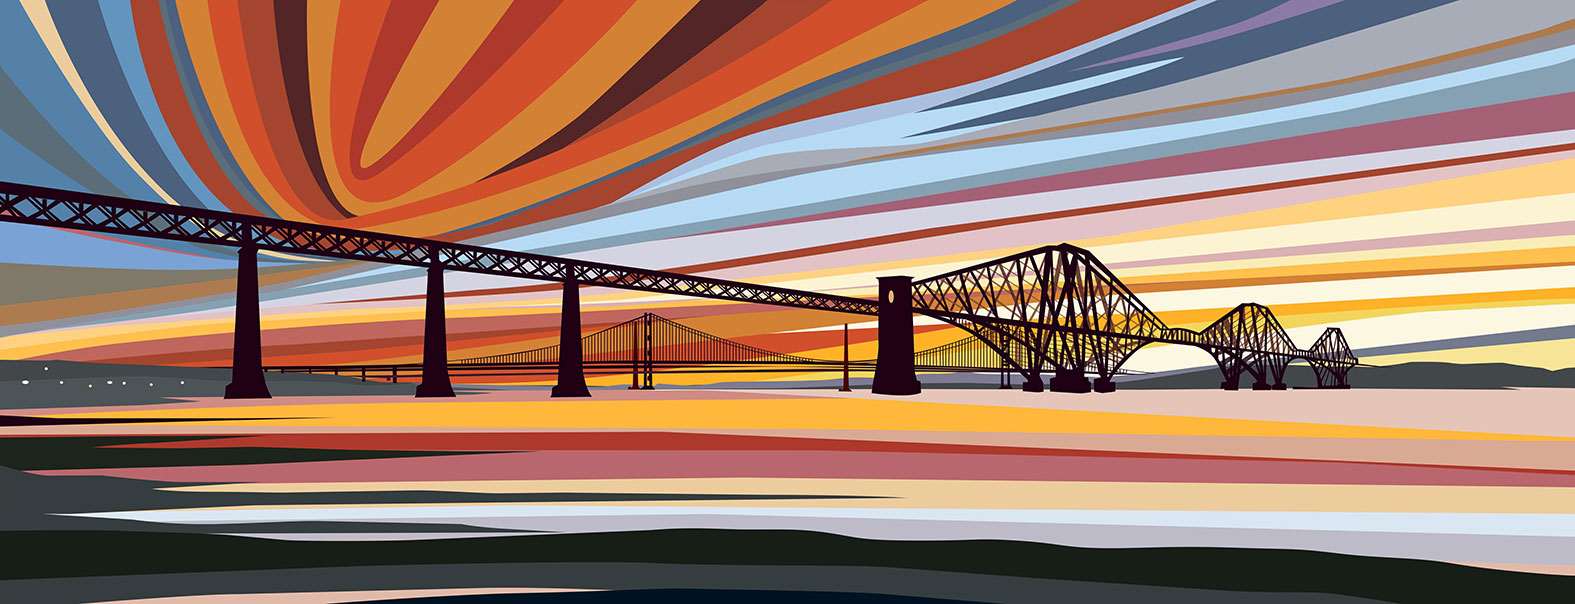 Sunset over Bridges, South Queensferry, Edinburgh. 2020